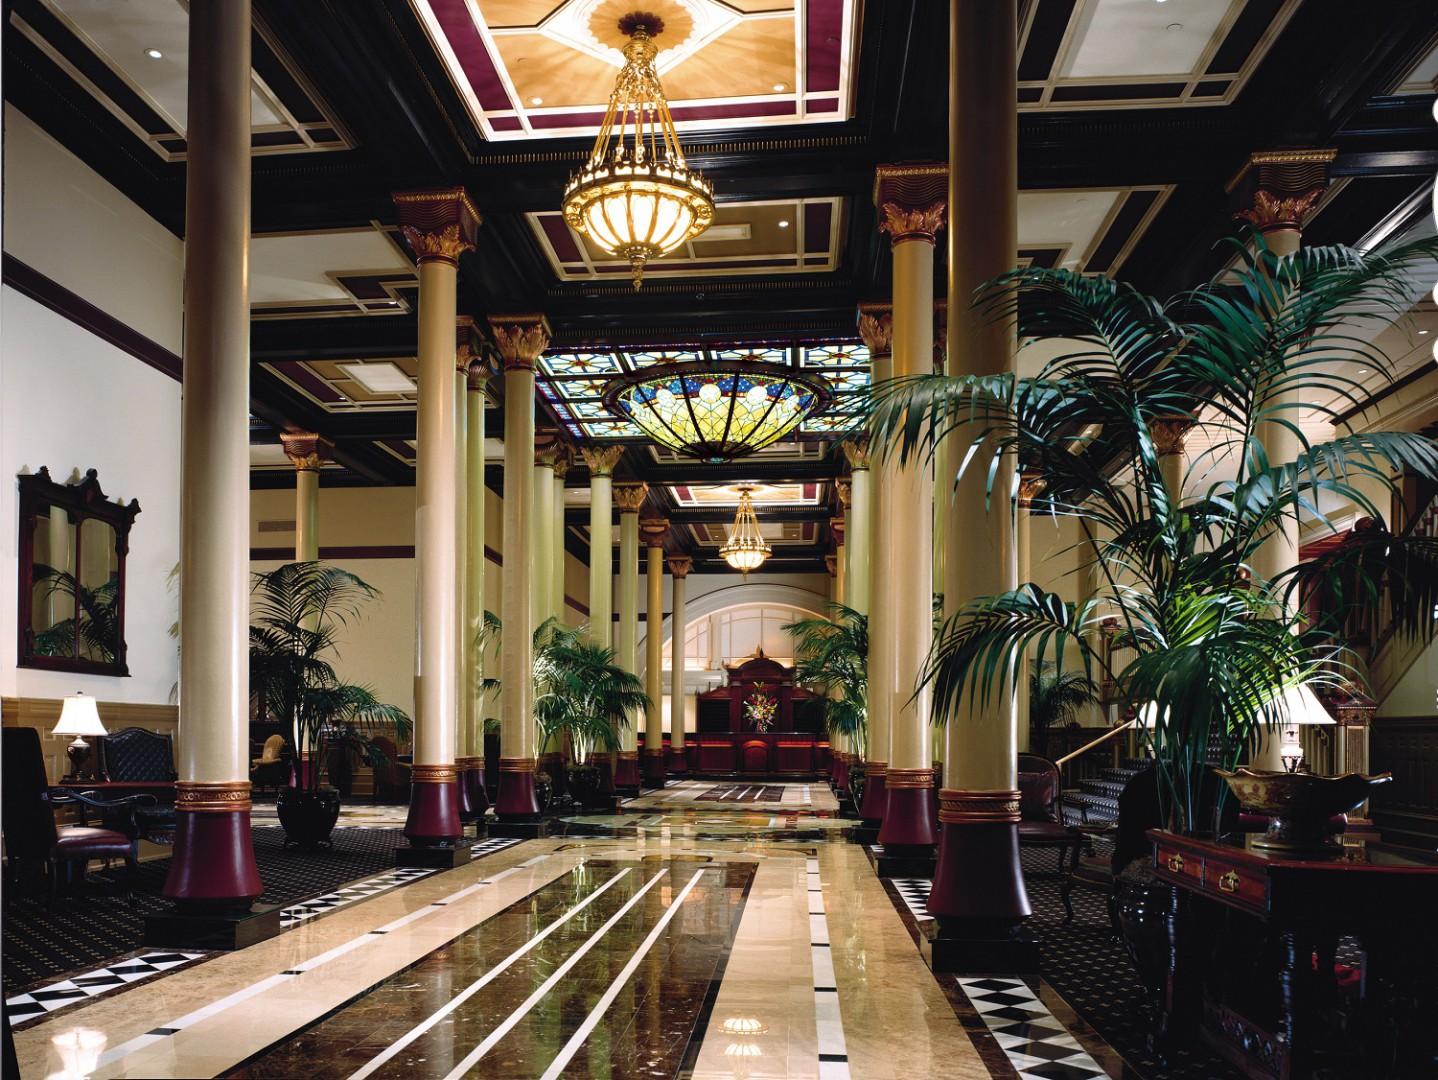 Sexual hotels austin tx